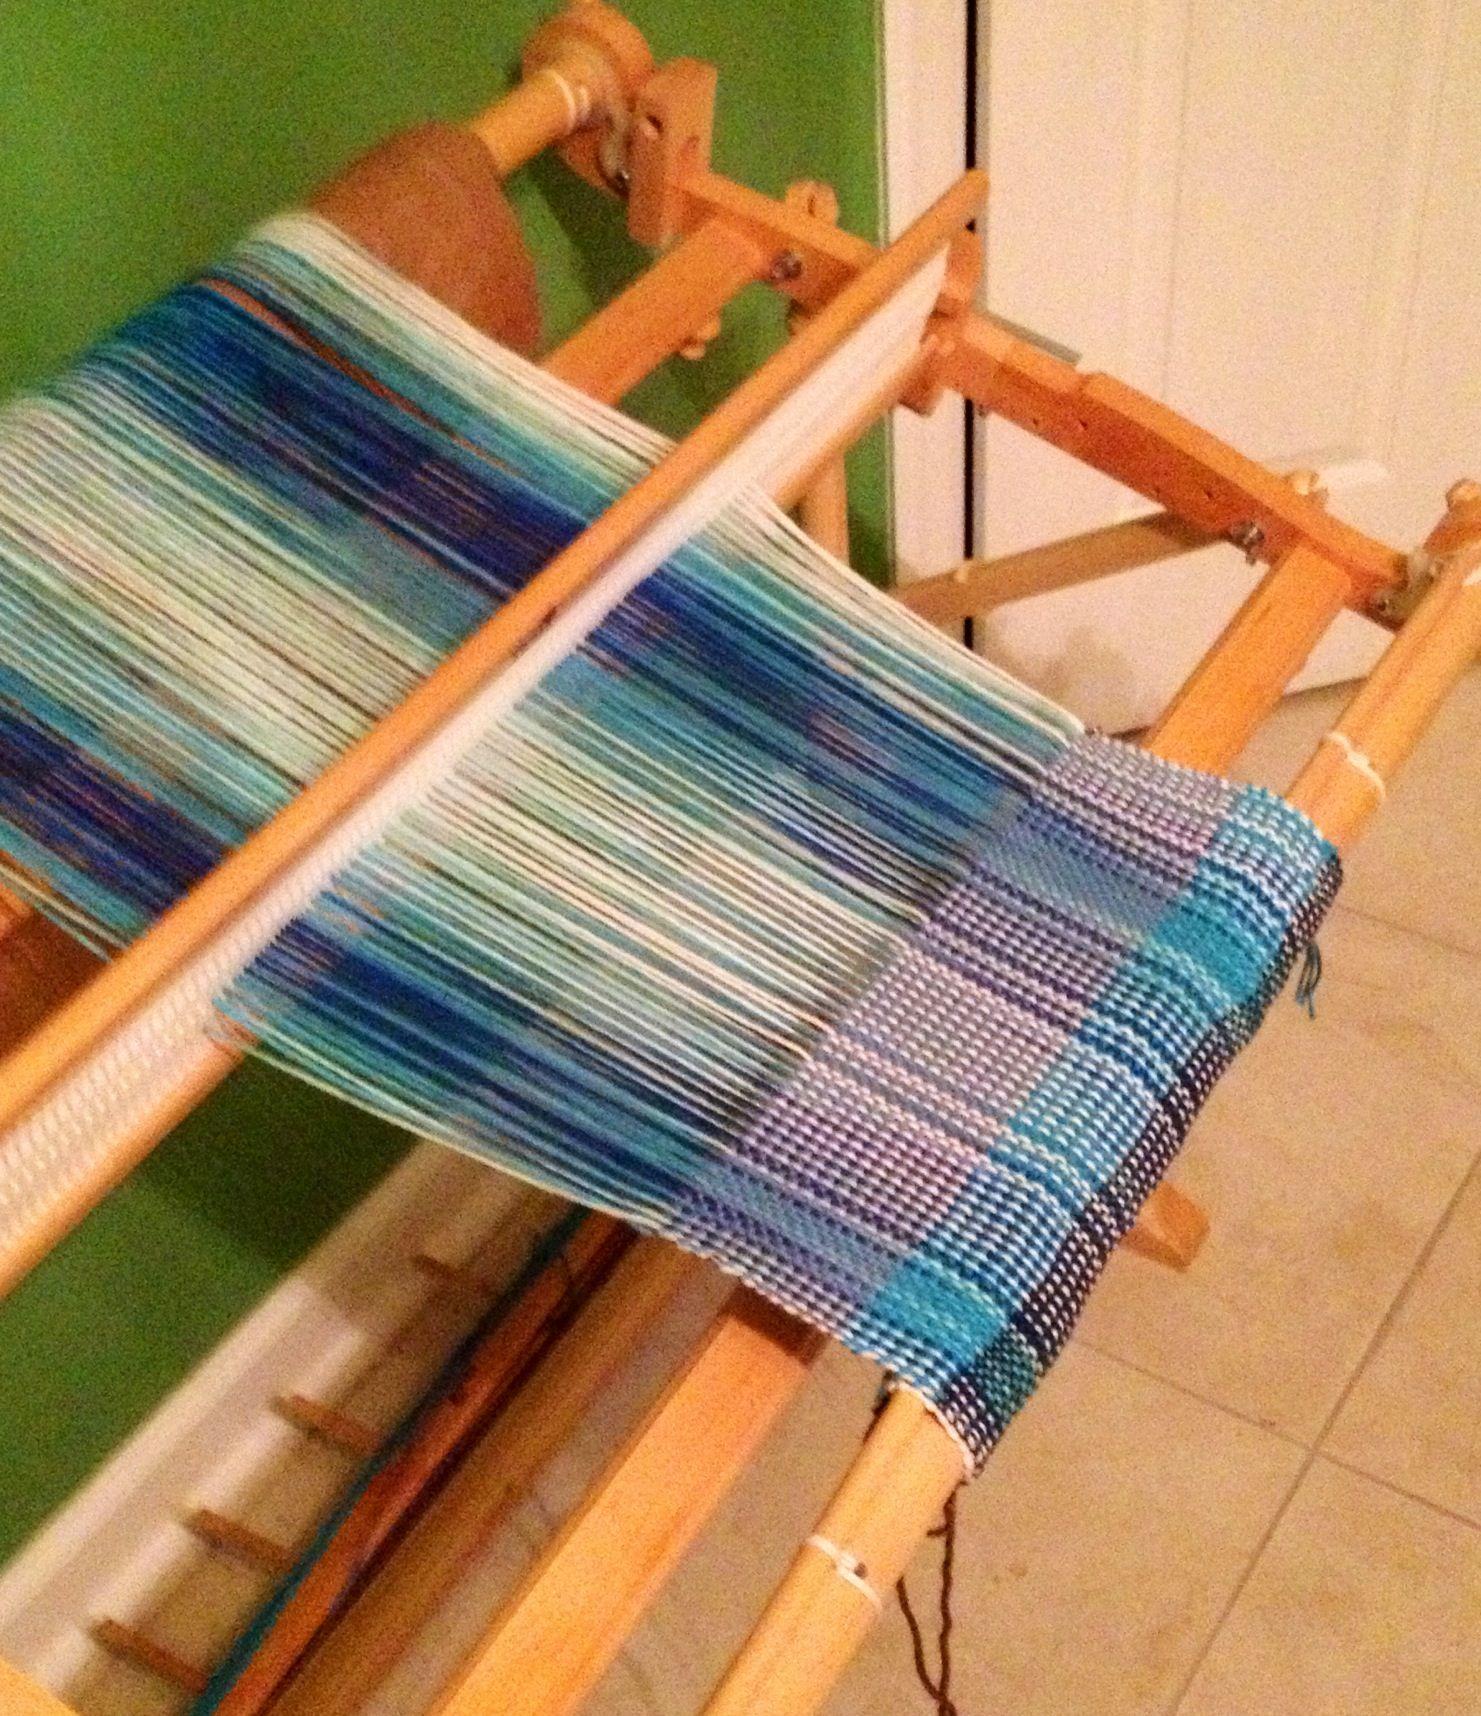 Tea Towels On The Rigid Heddle Loom Craftsy Com Online Weaving Class Weaving Loom Diy Loom Weaving Rigid Heddle Weaving